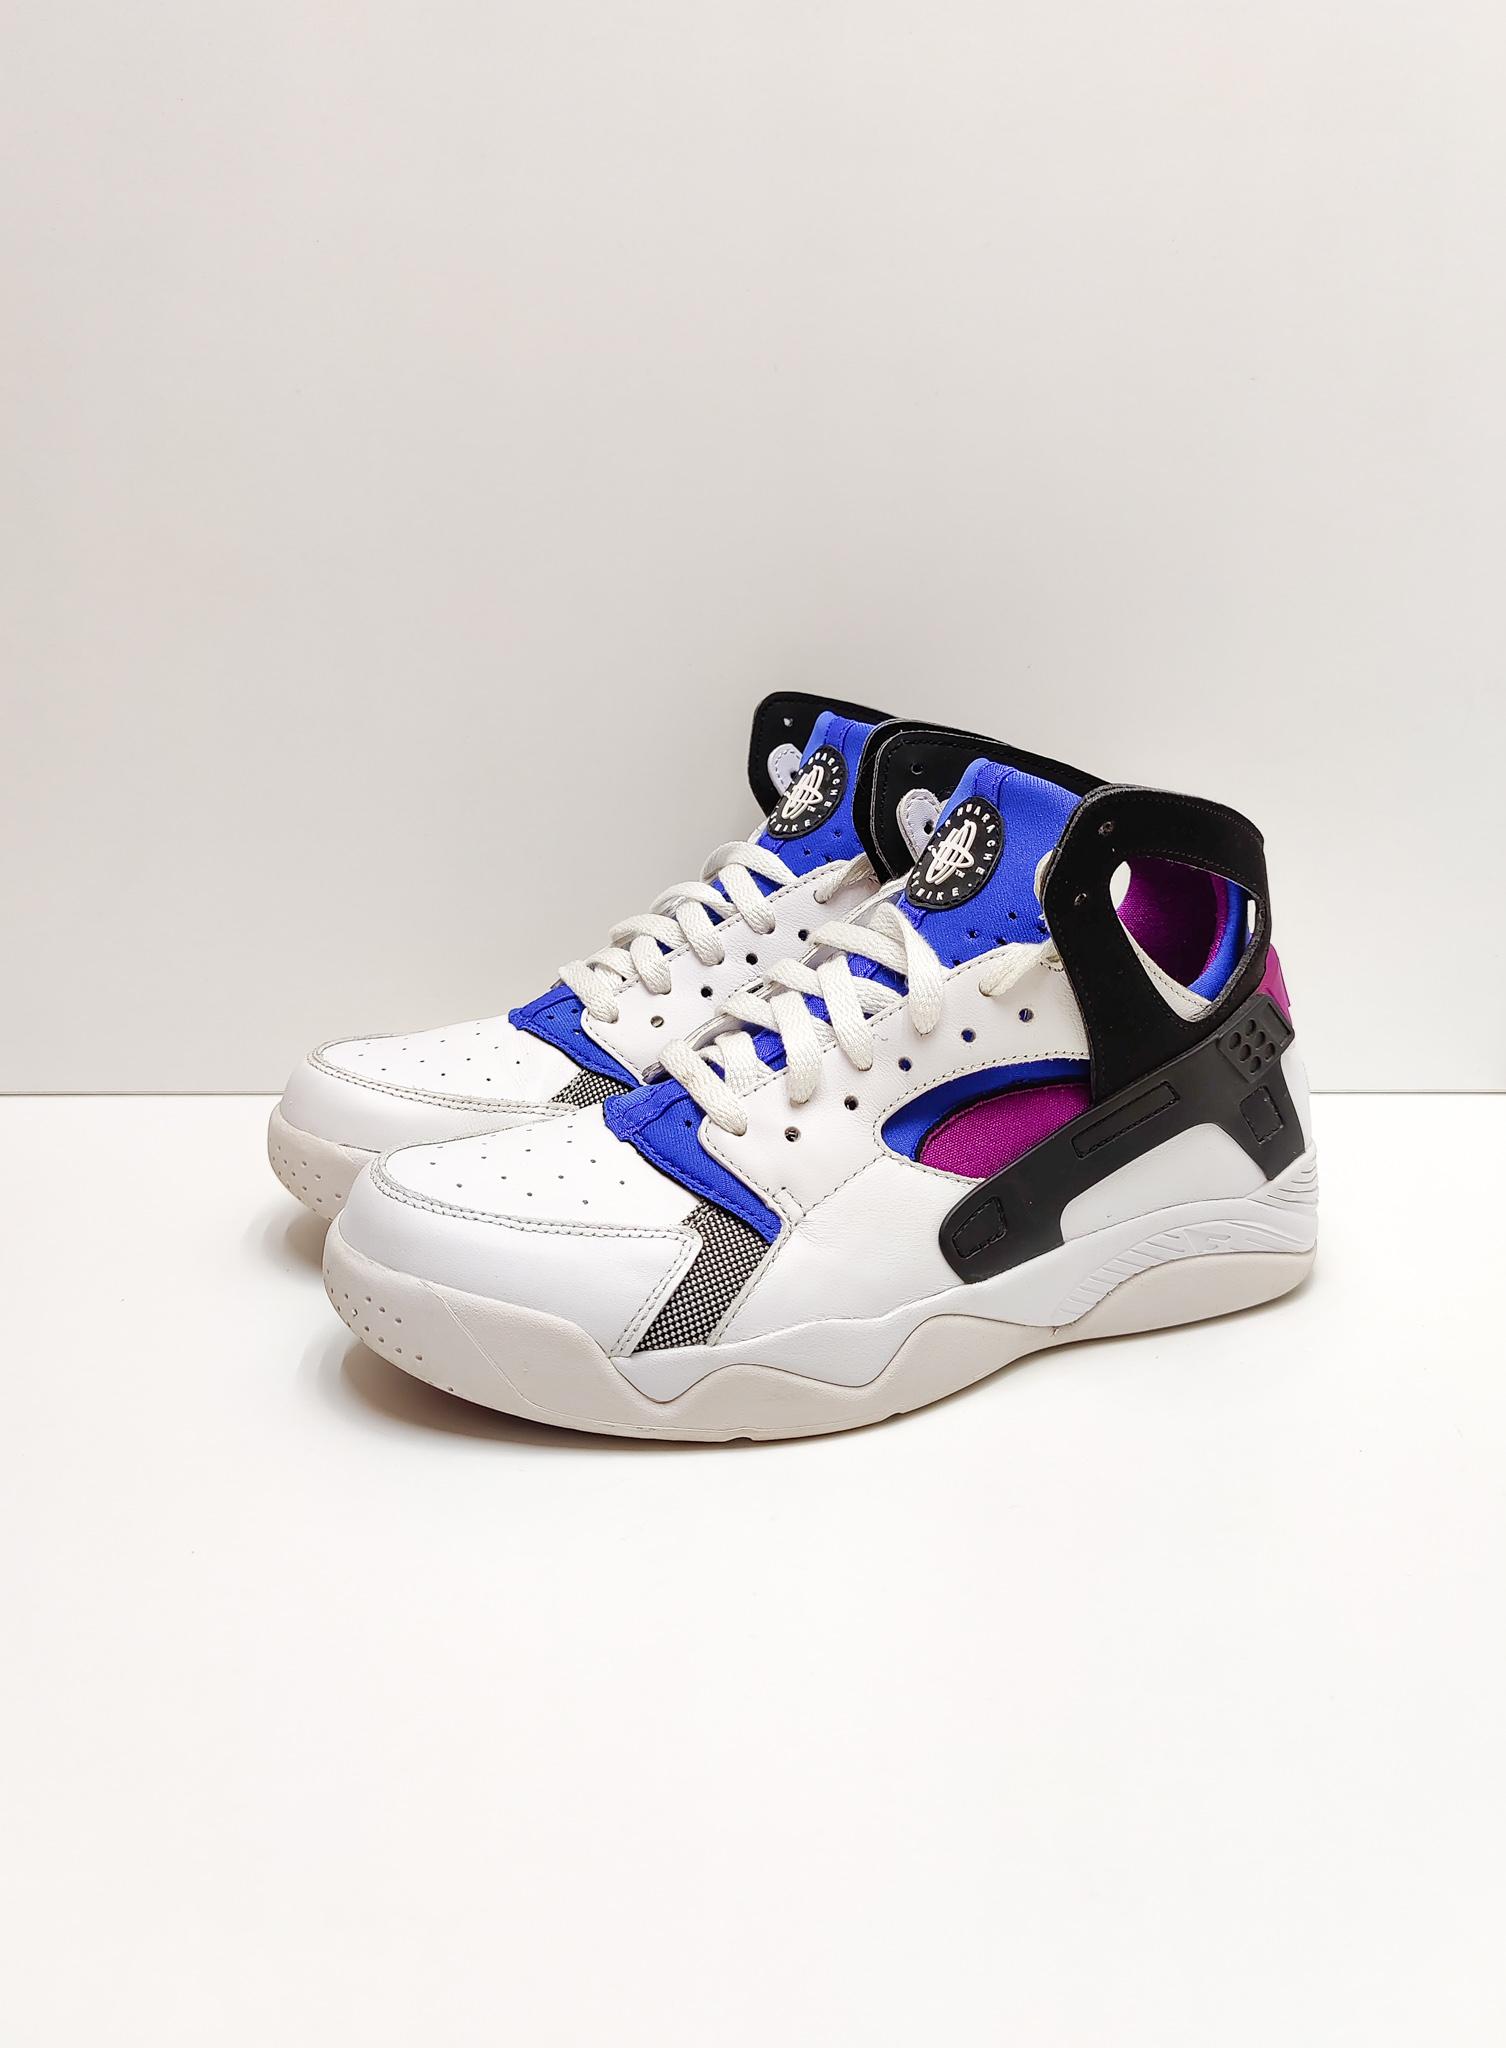 Nike Air Flight Huarache OG